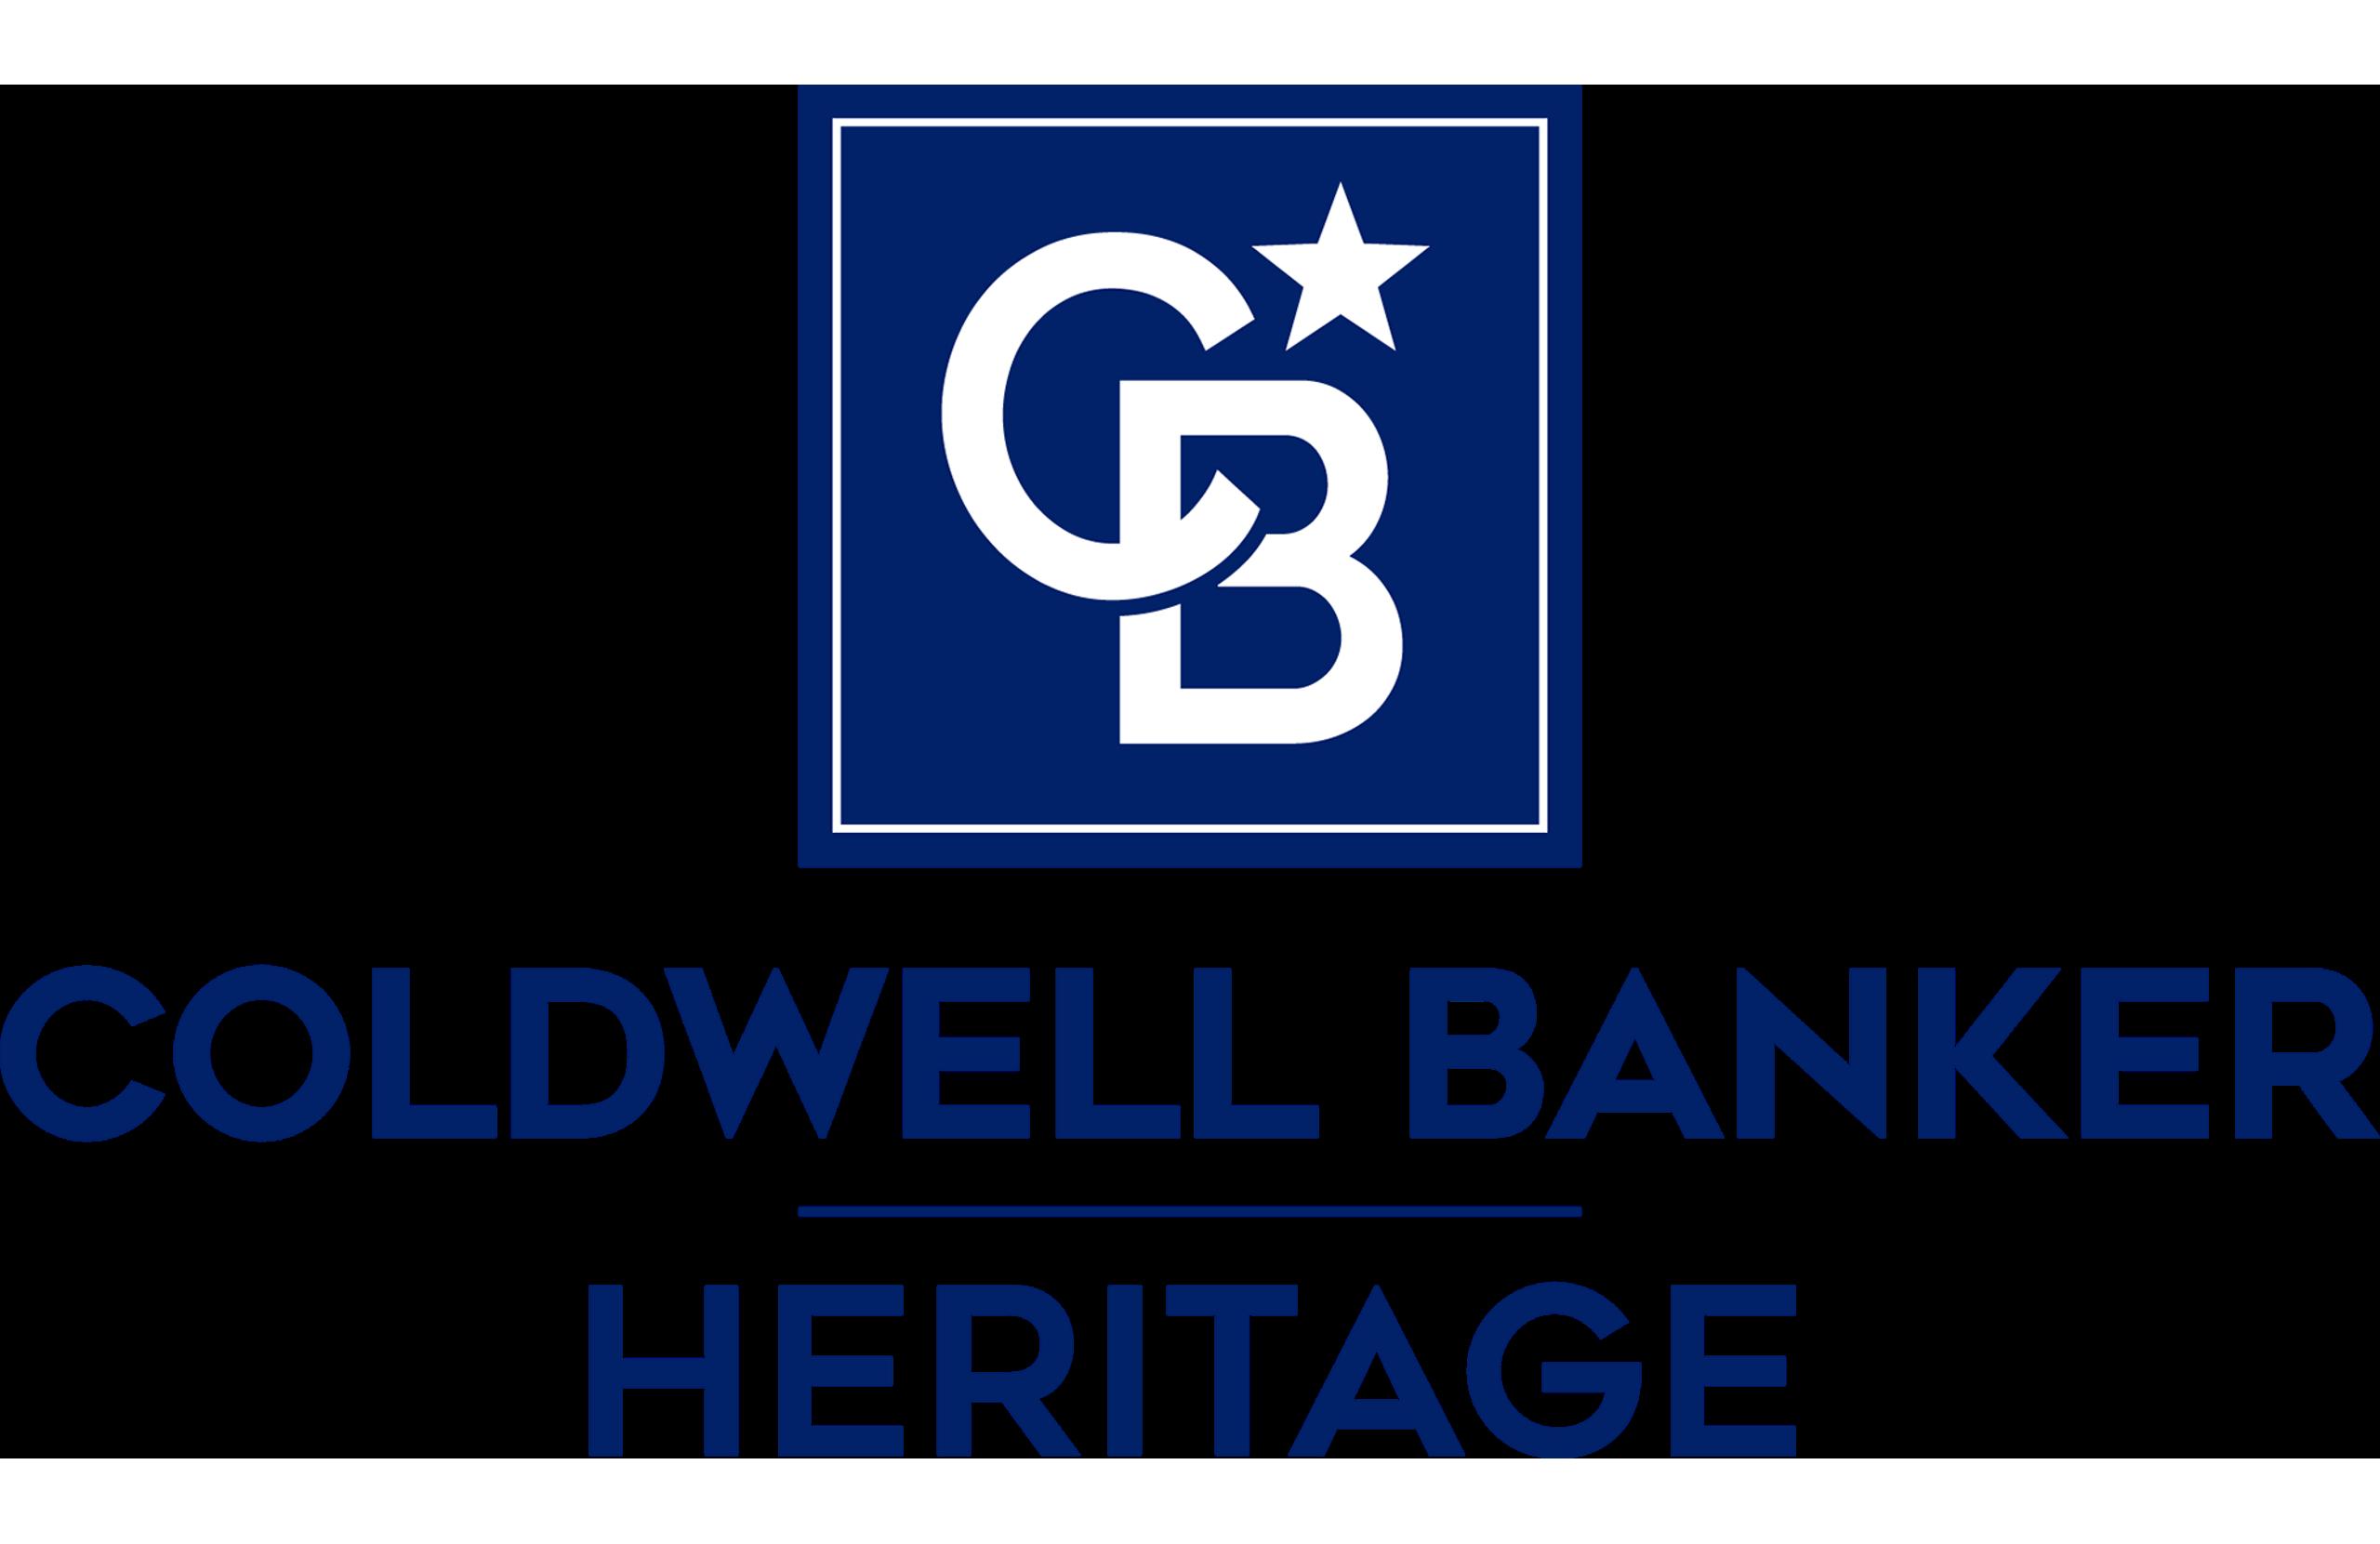 Taylor Hefferon - Coldwell Banker Heritage Logo